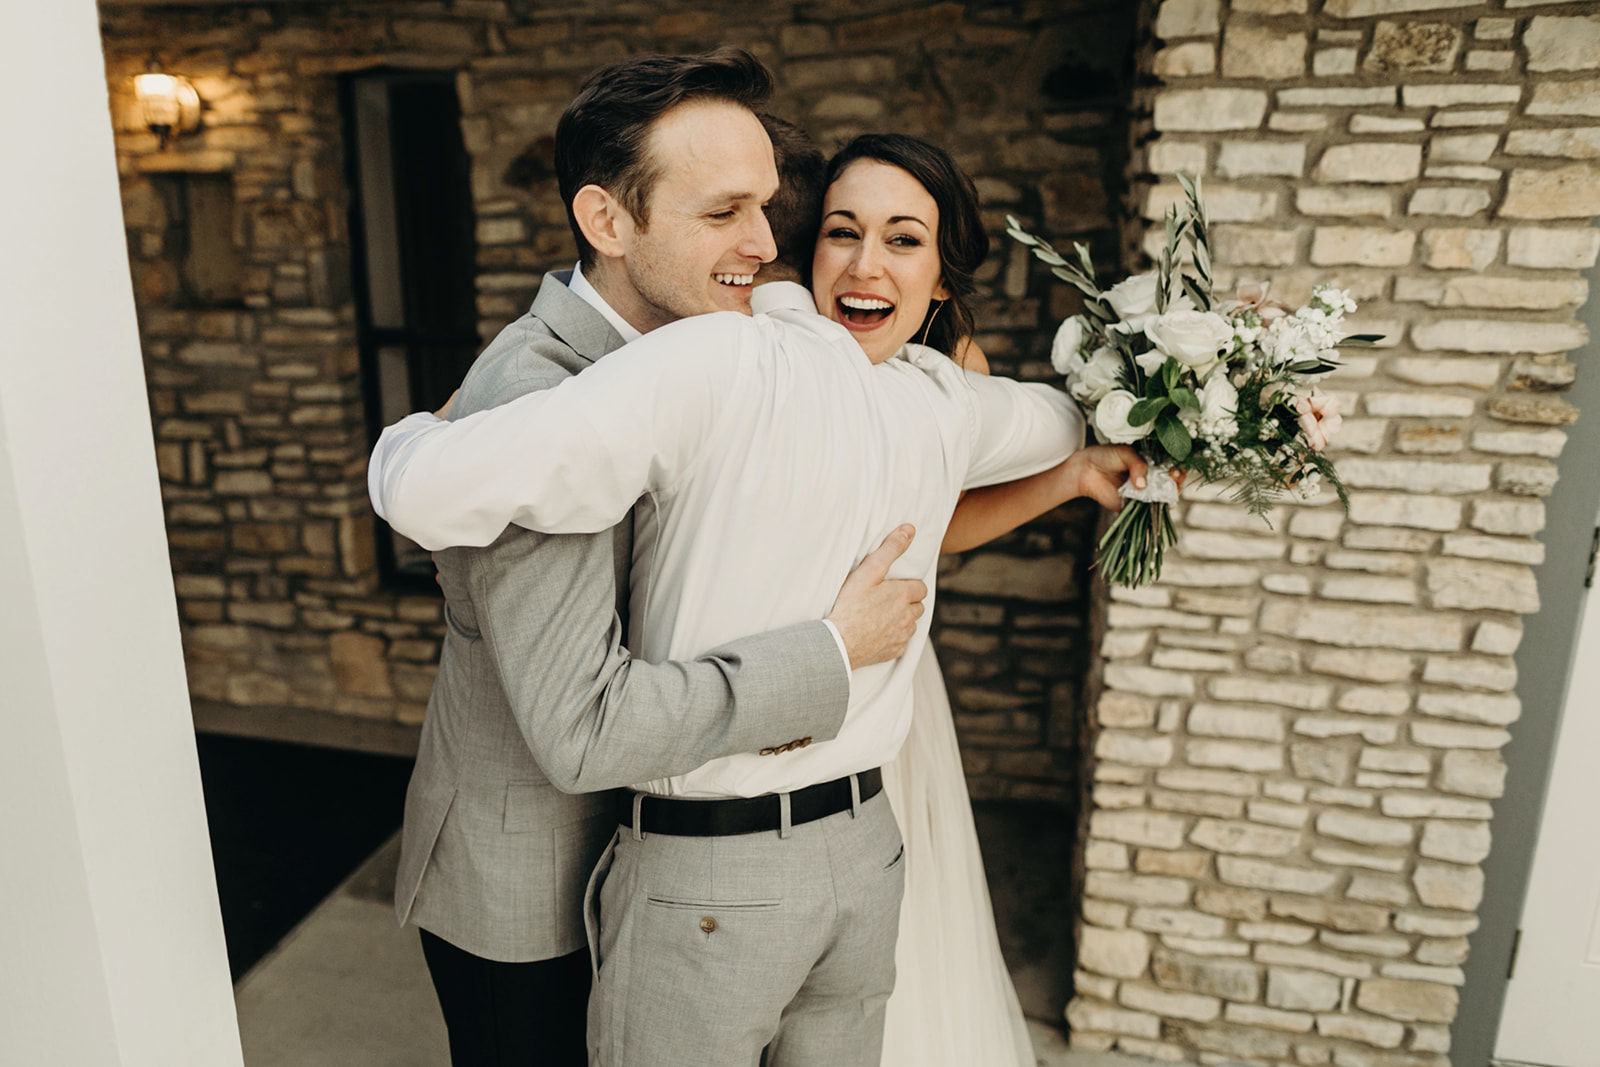 austin-wedding-lindsey-bryce-417.jpg